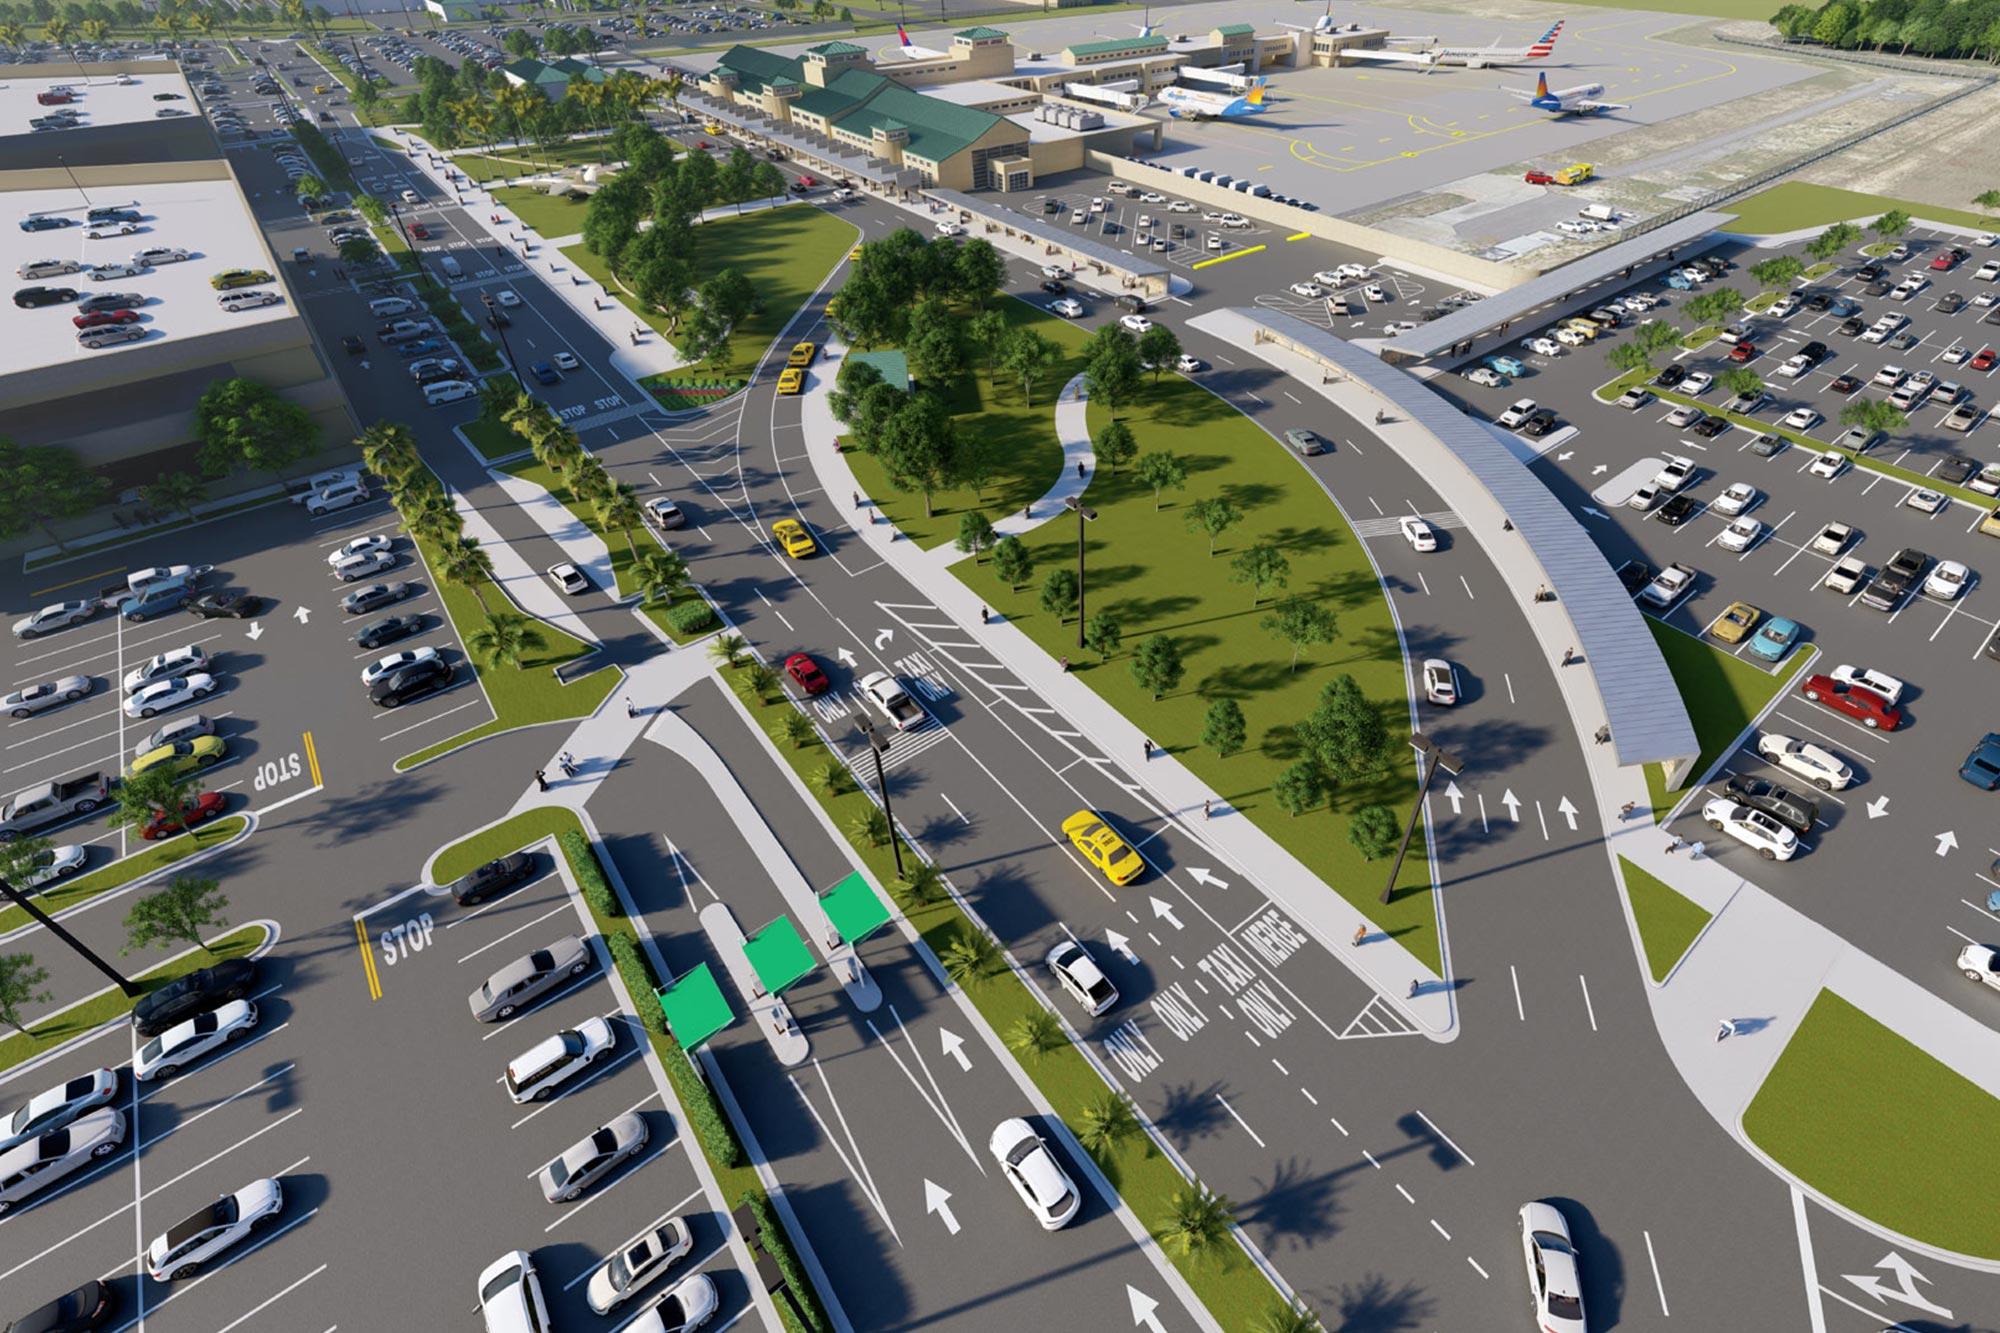 General Aviation Airport